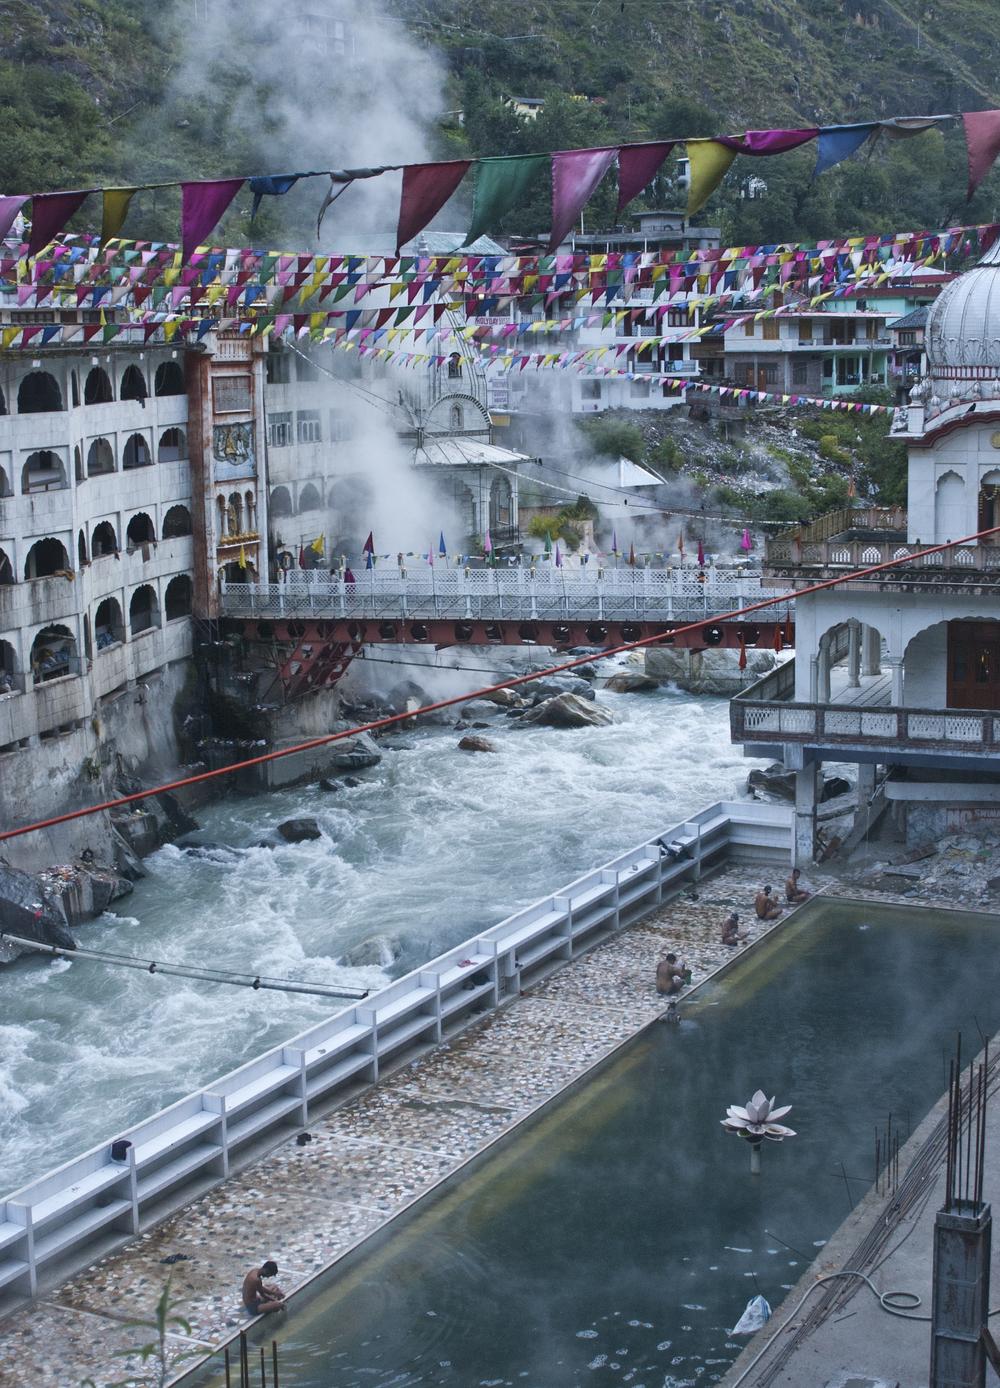 Pilgrims bathe in the hot springs of Manikaran next to the roaring Parvati River.